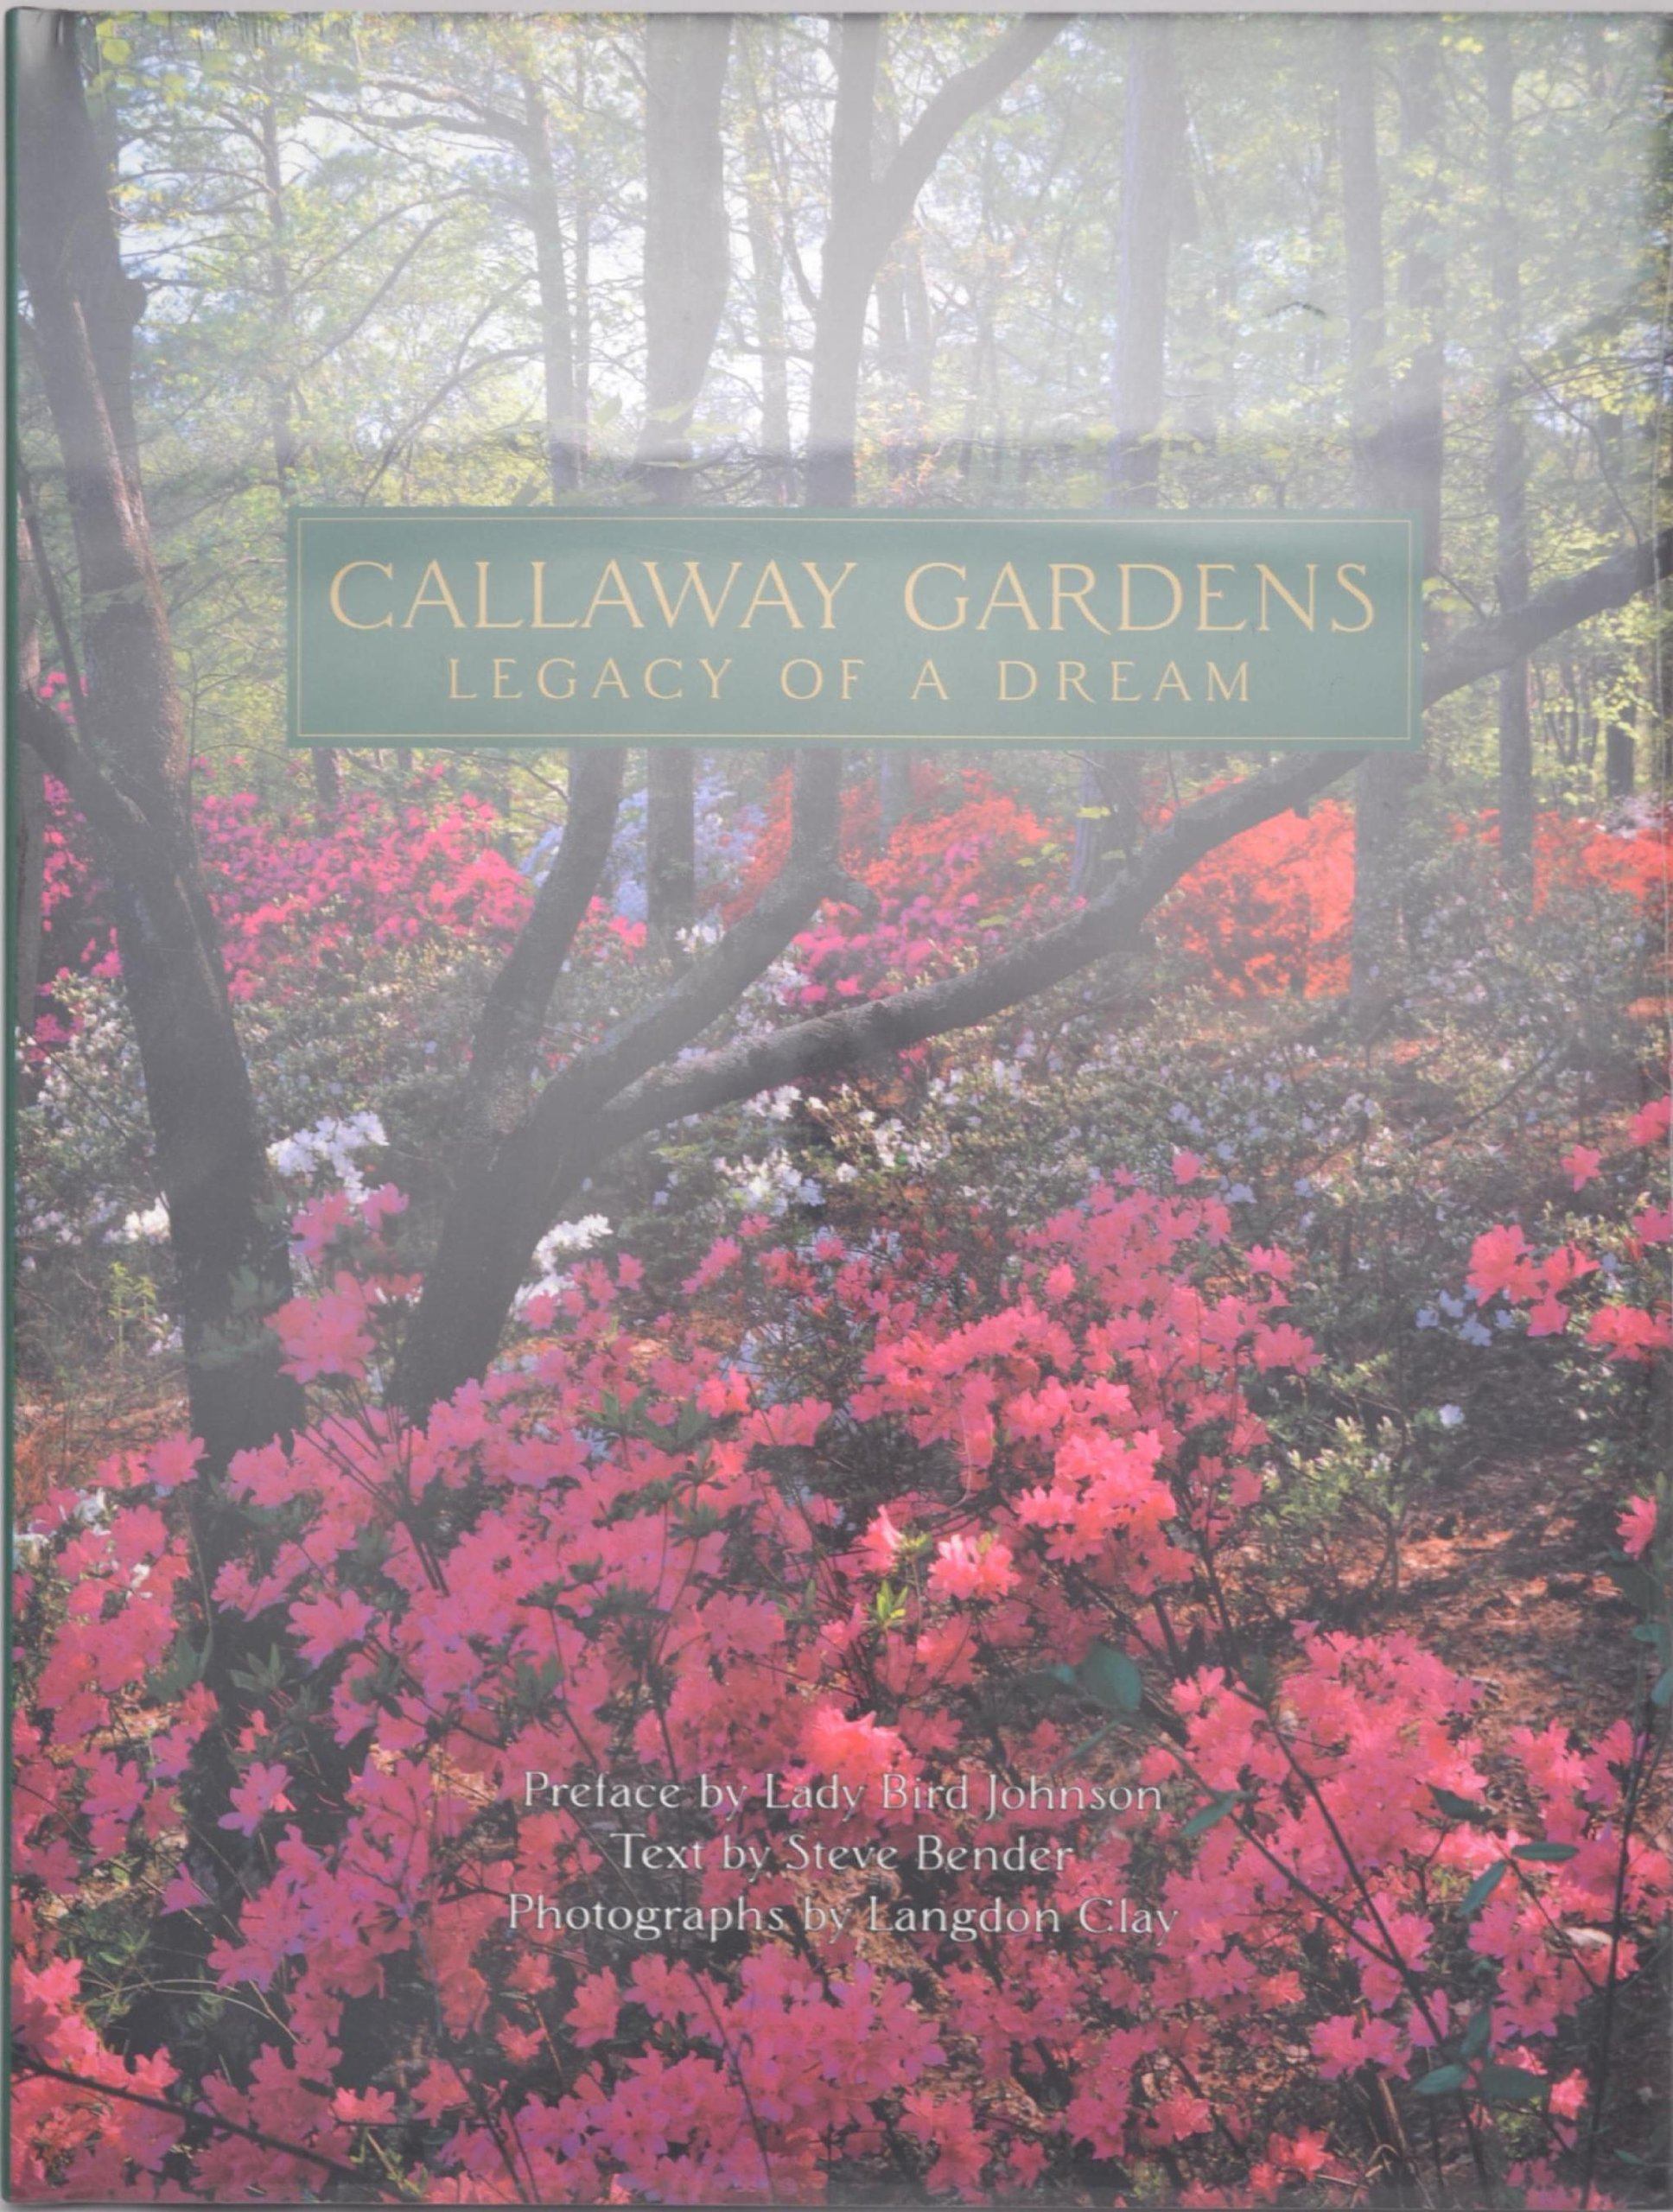 Callaway Gardens: Legacy of a Dream